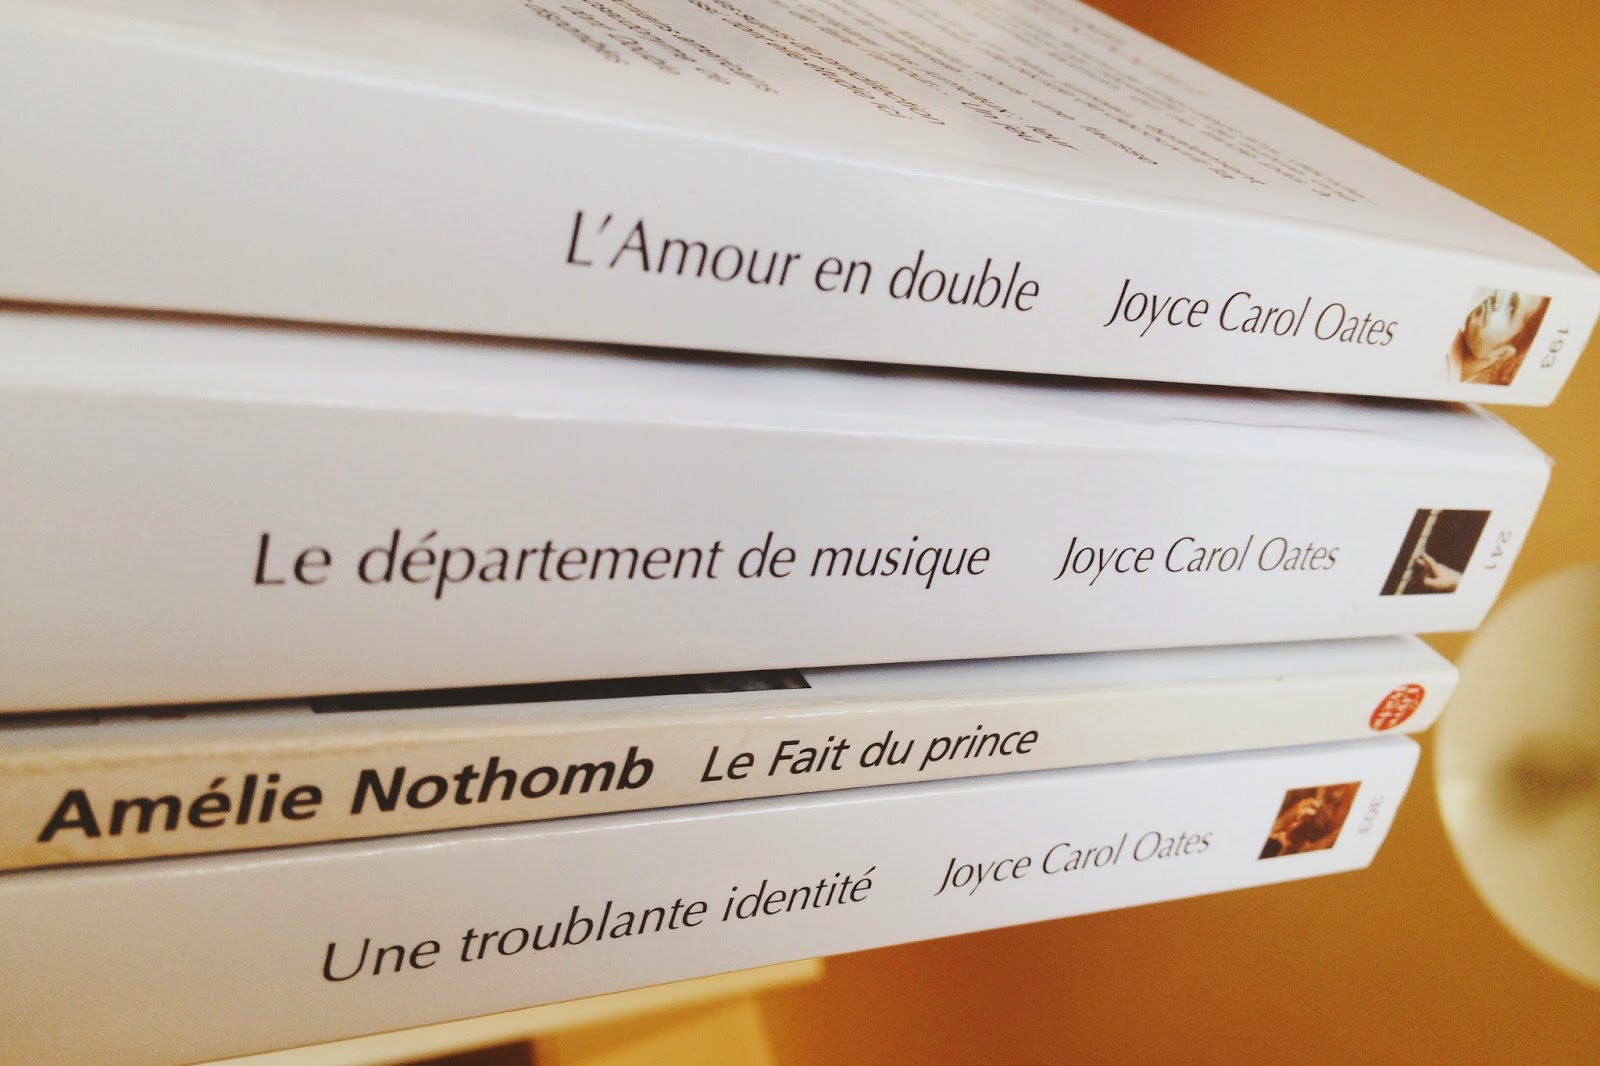 Joyce Carol Oates Amelie Nothomb